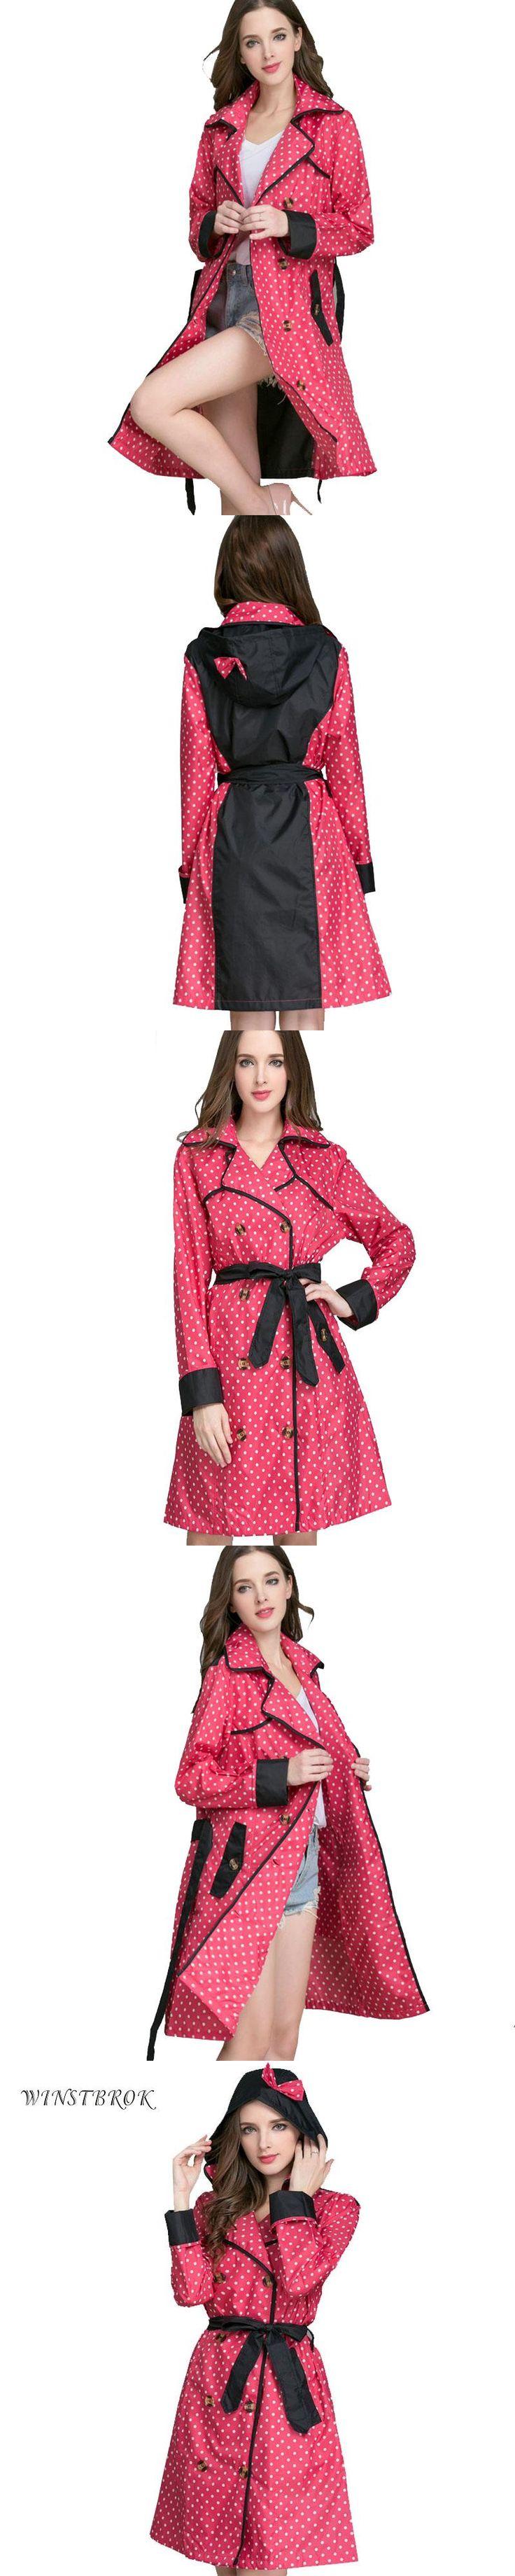 WINSTBROK Long Raincoat Women Ladies Rain Coat 2017 Women's Rainwear Breathable Outdoor Travel Water-Repellent  Riding Clothes